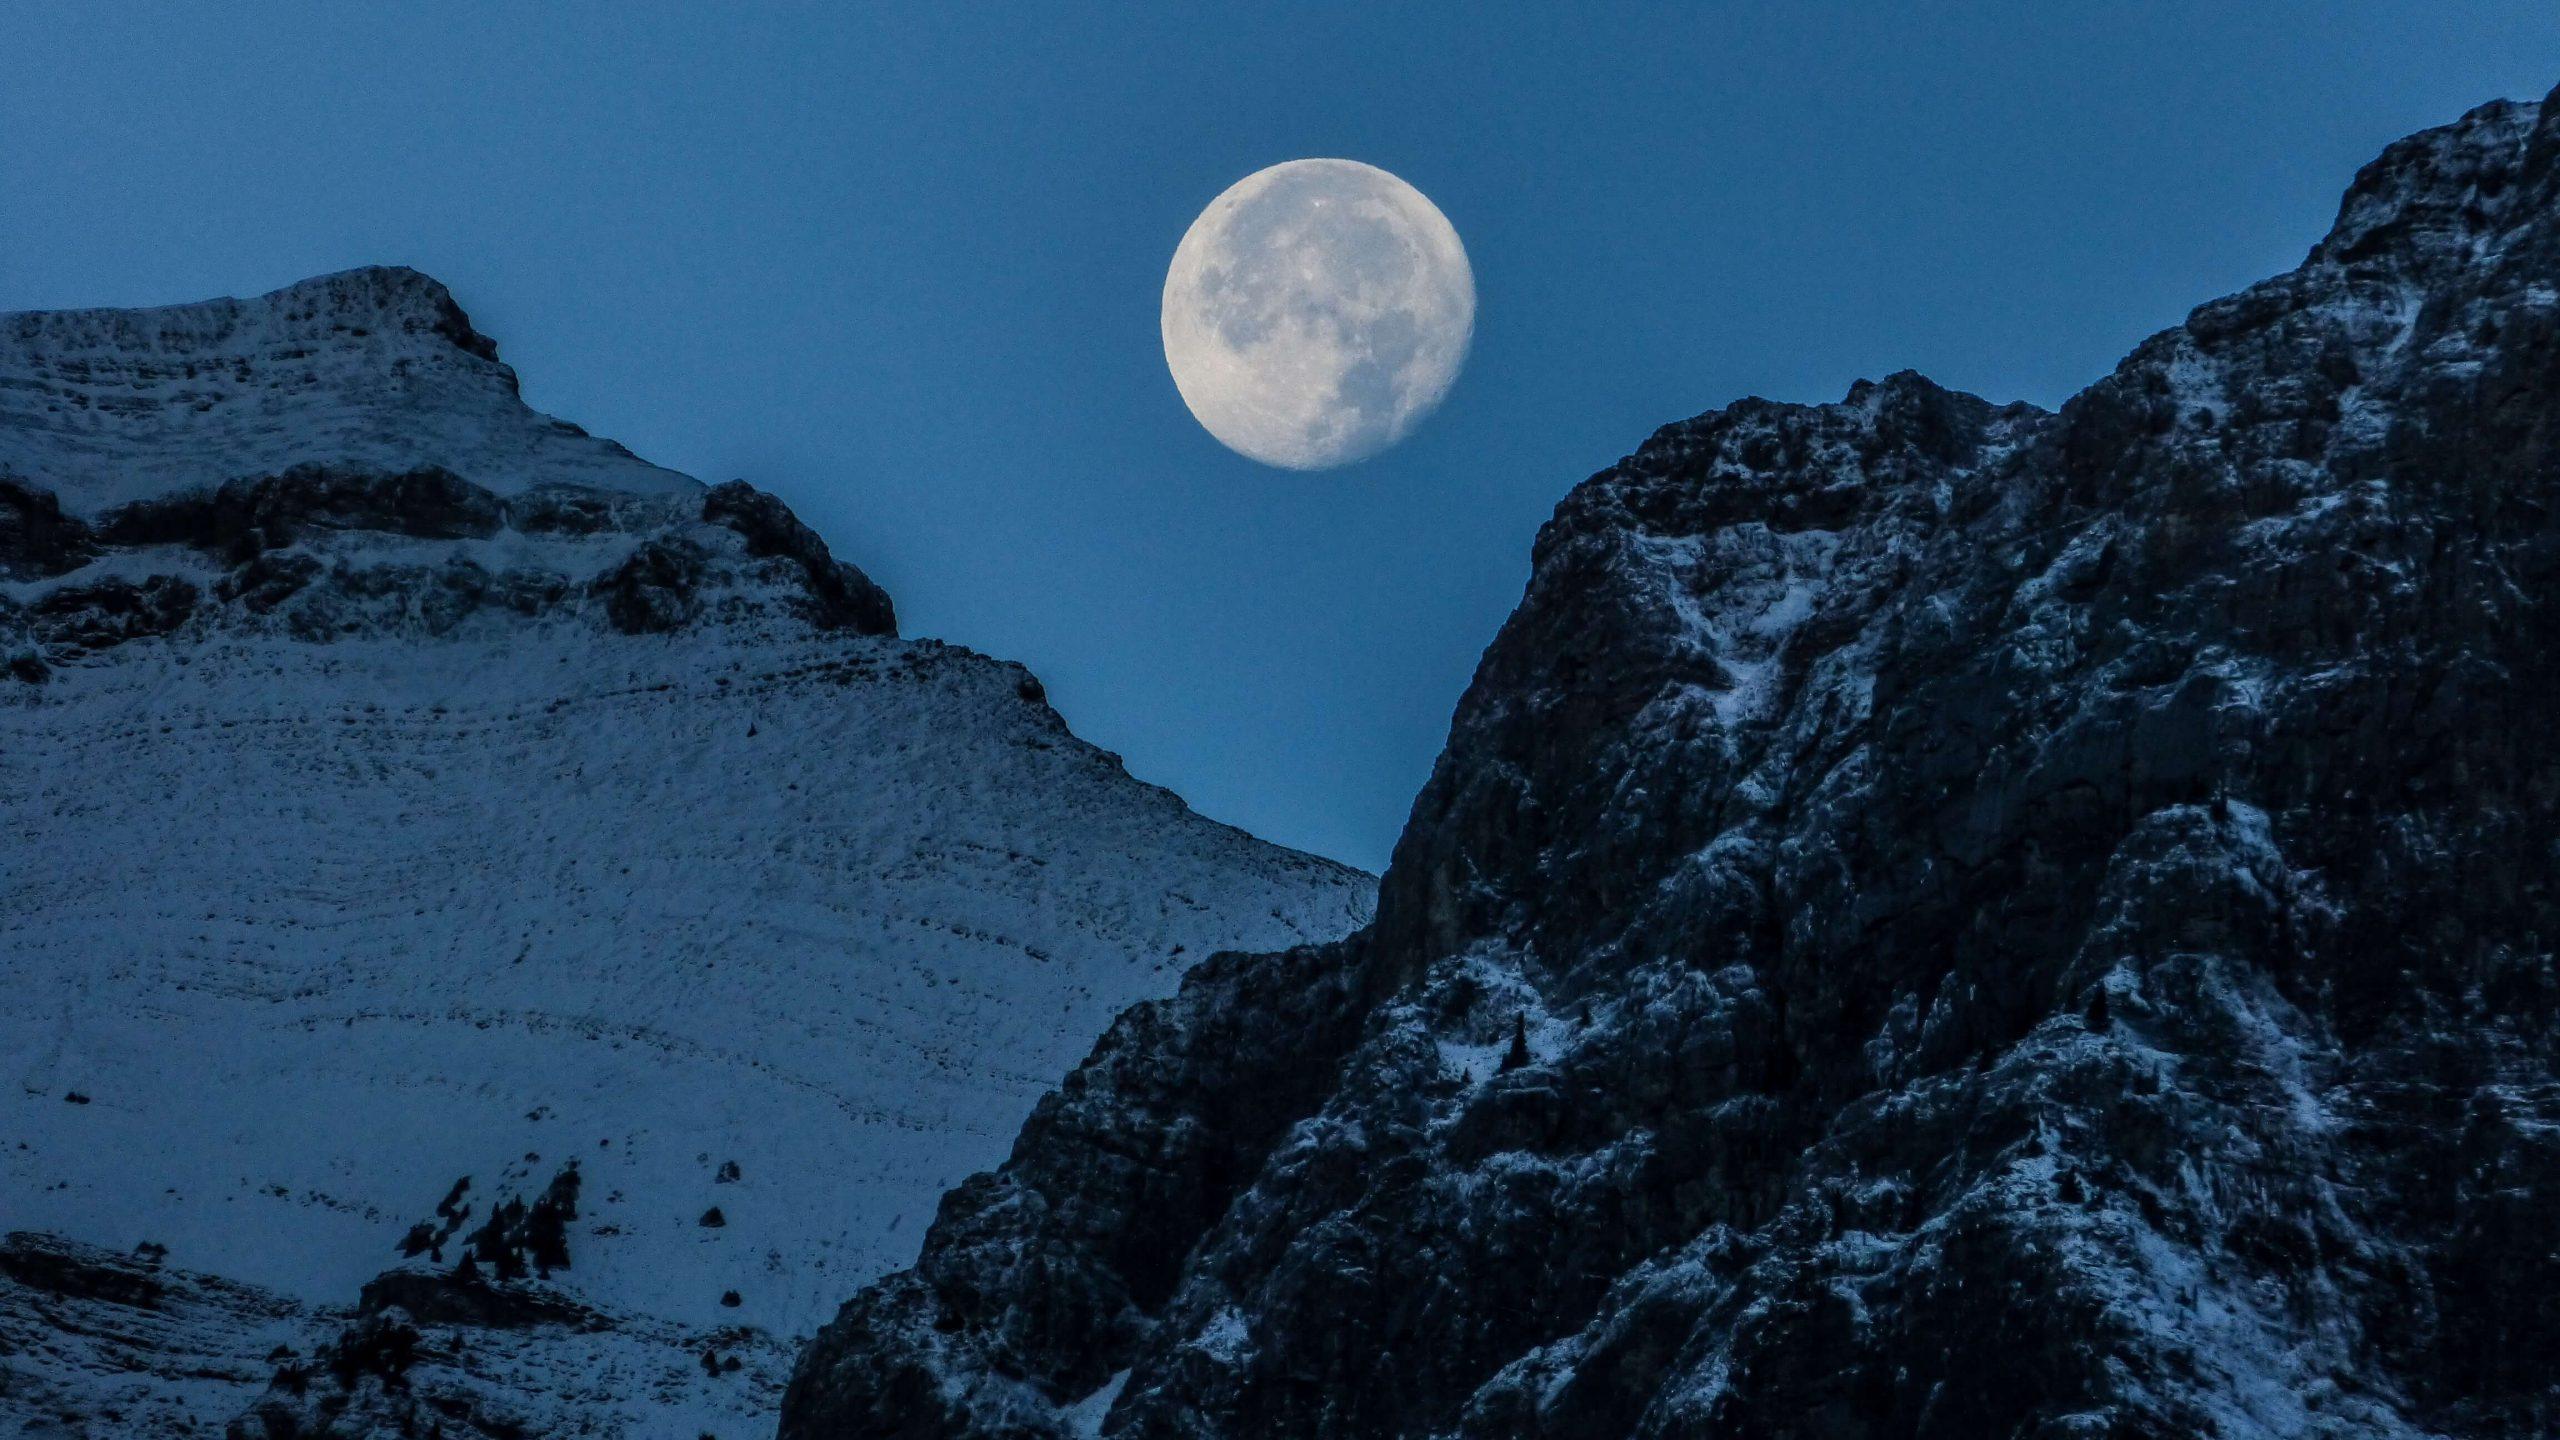 Objectif Lune Oodrive